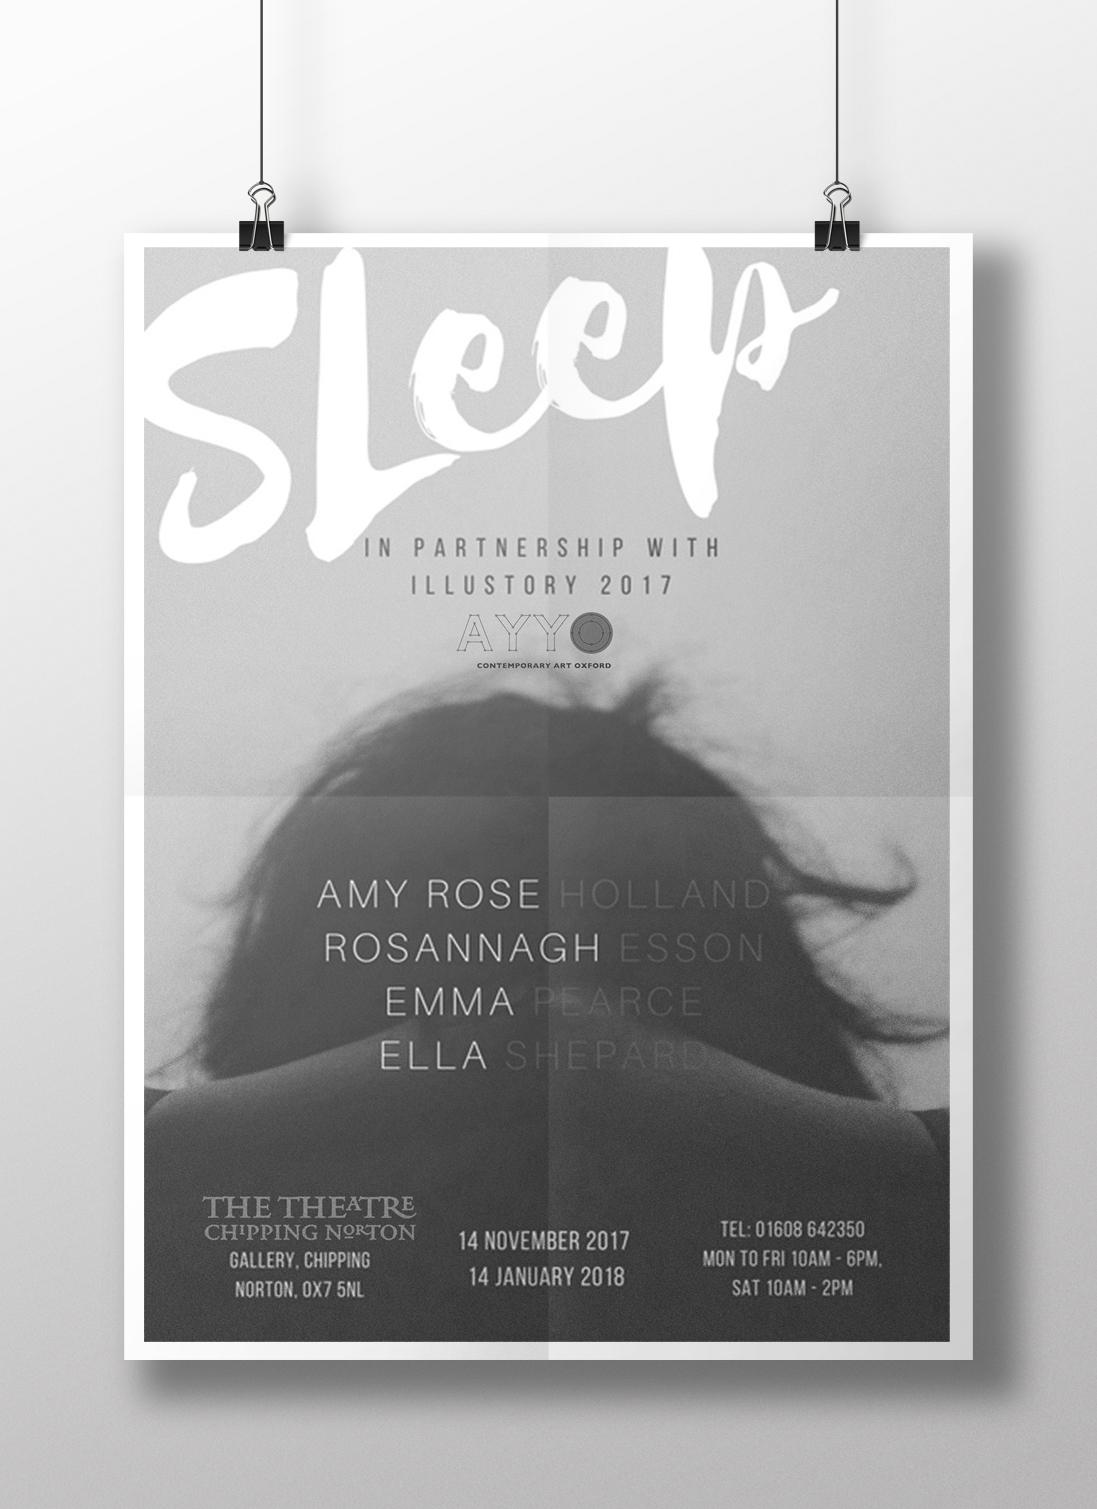 Sleep Exhibition - Artist Advertising